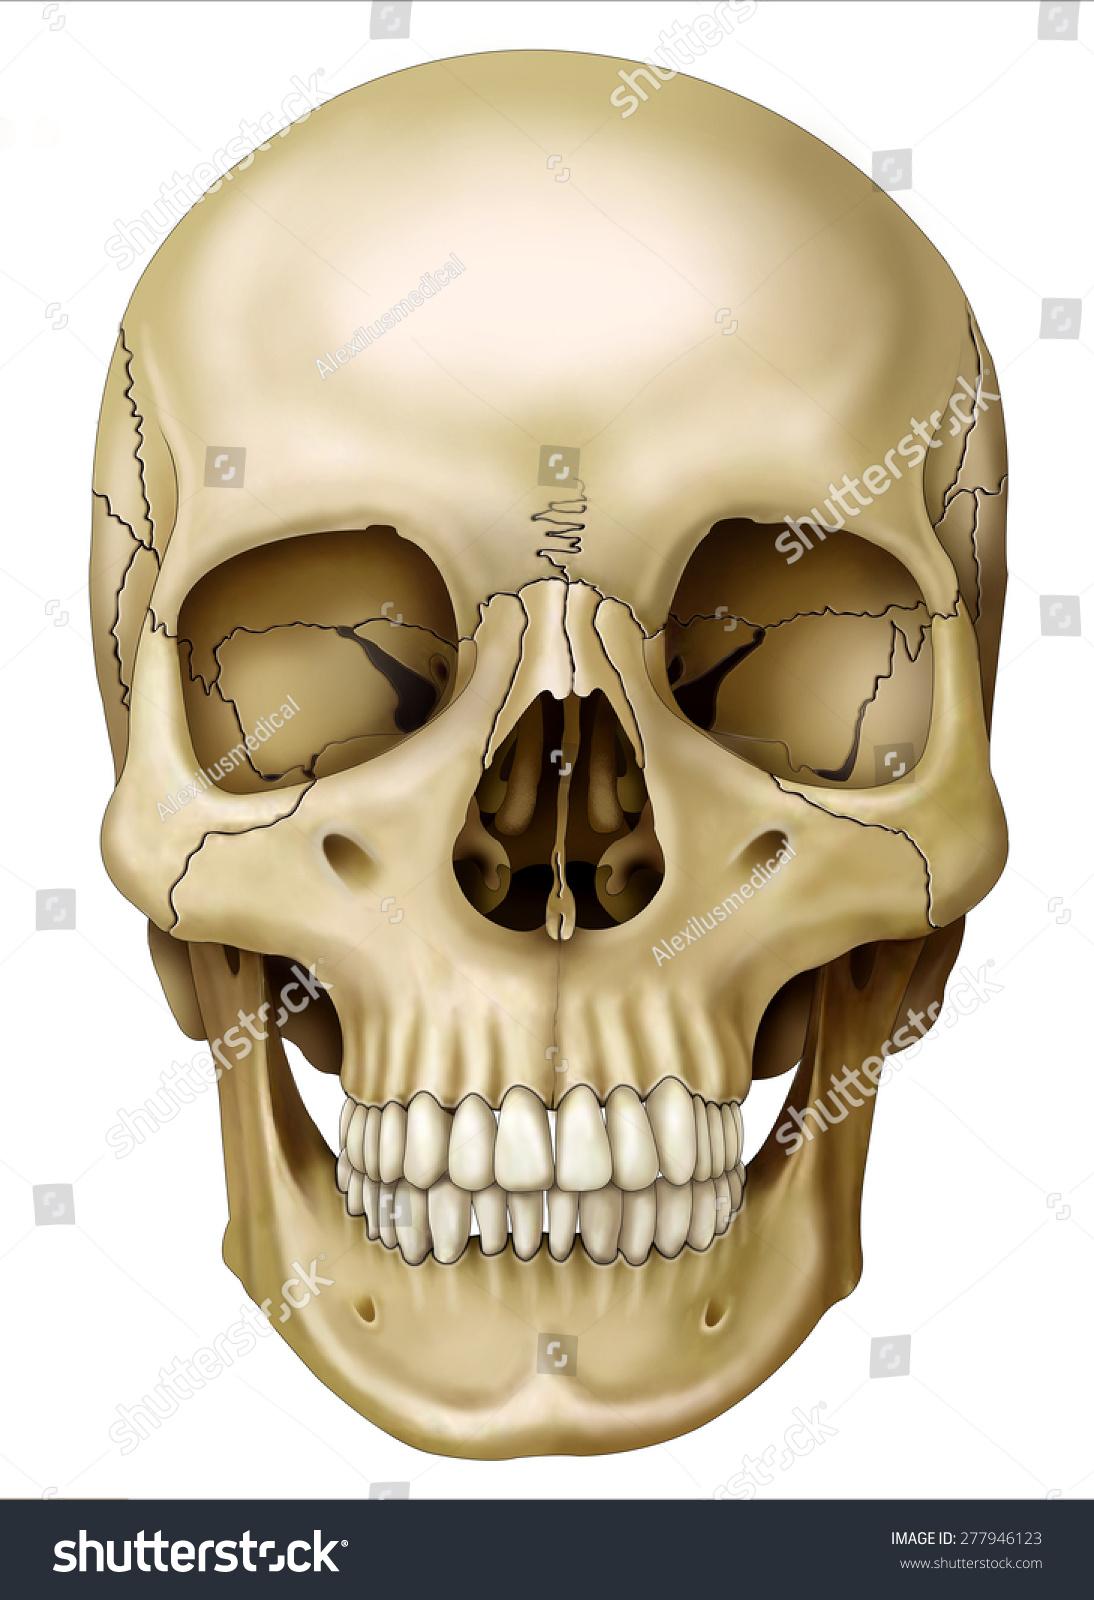 Human Skull Front